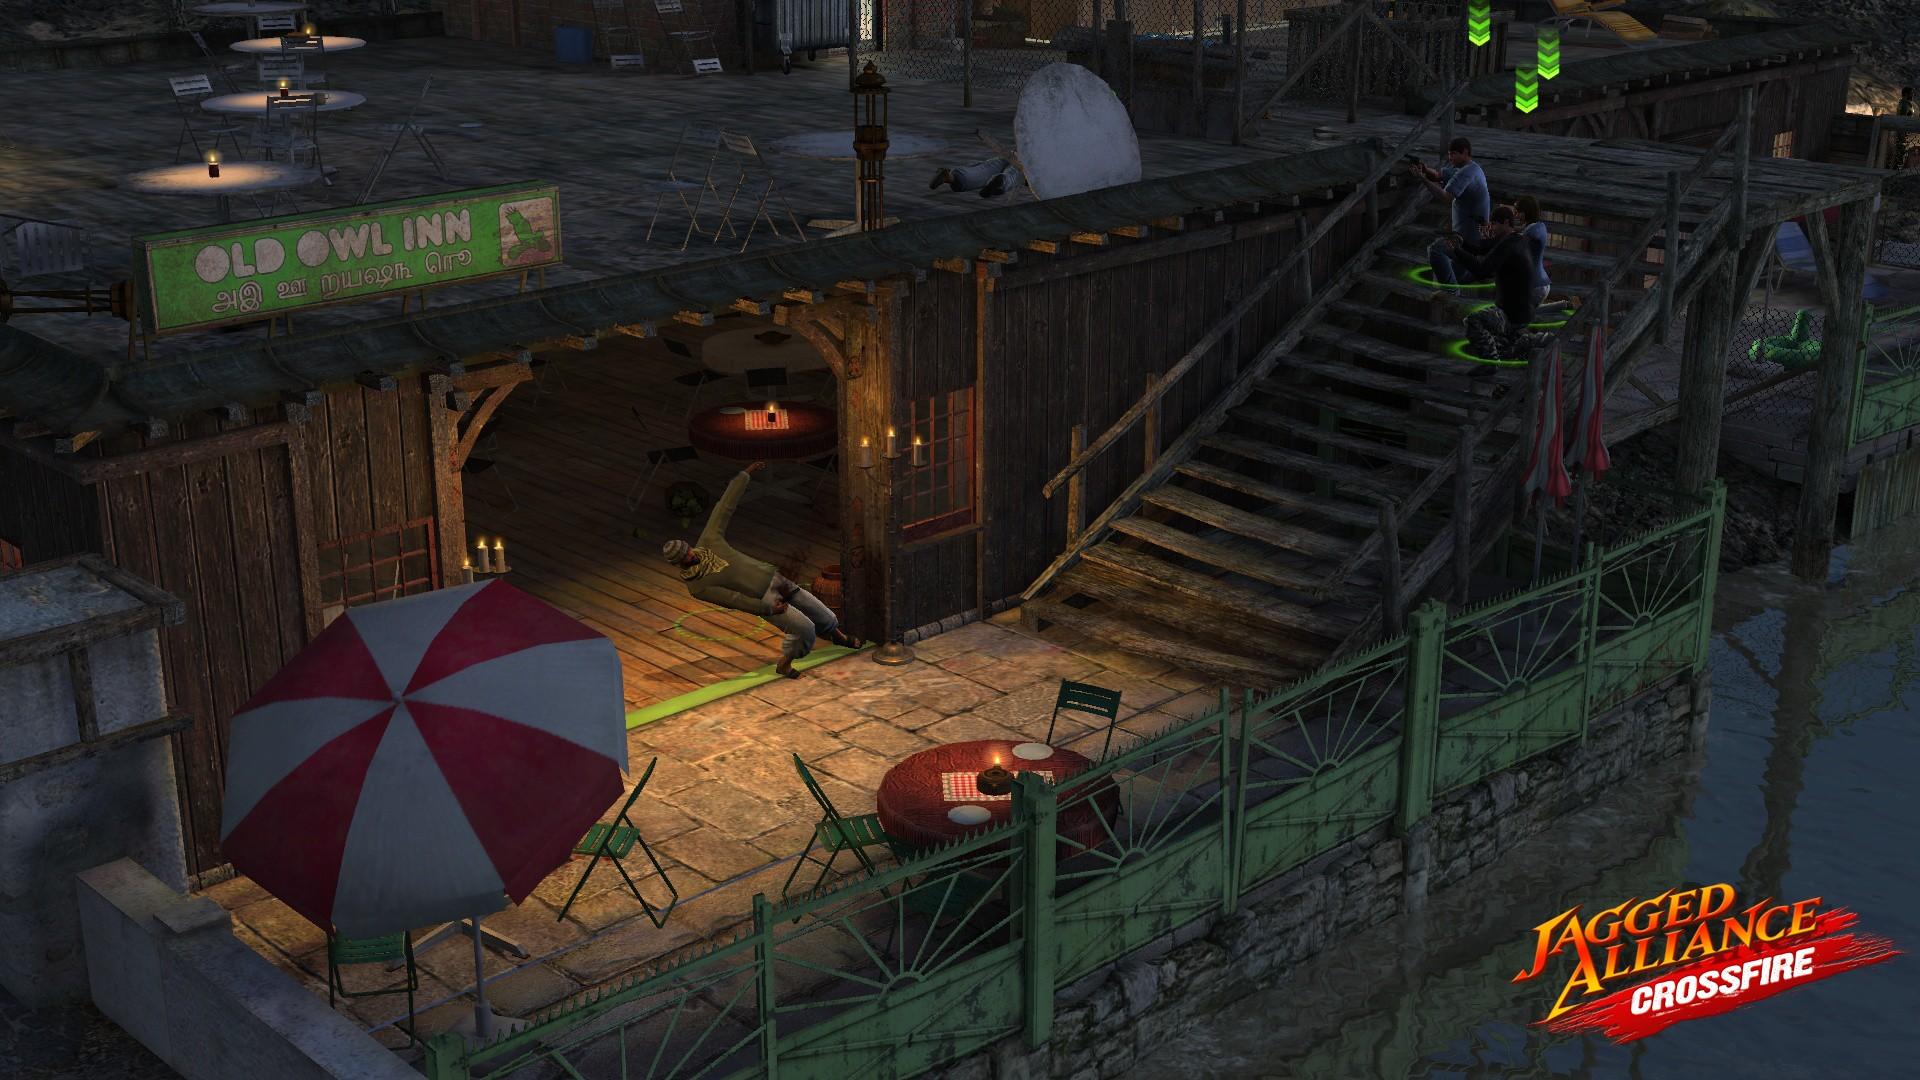 Jagged Alliance: Crossfire screenshot